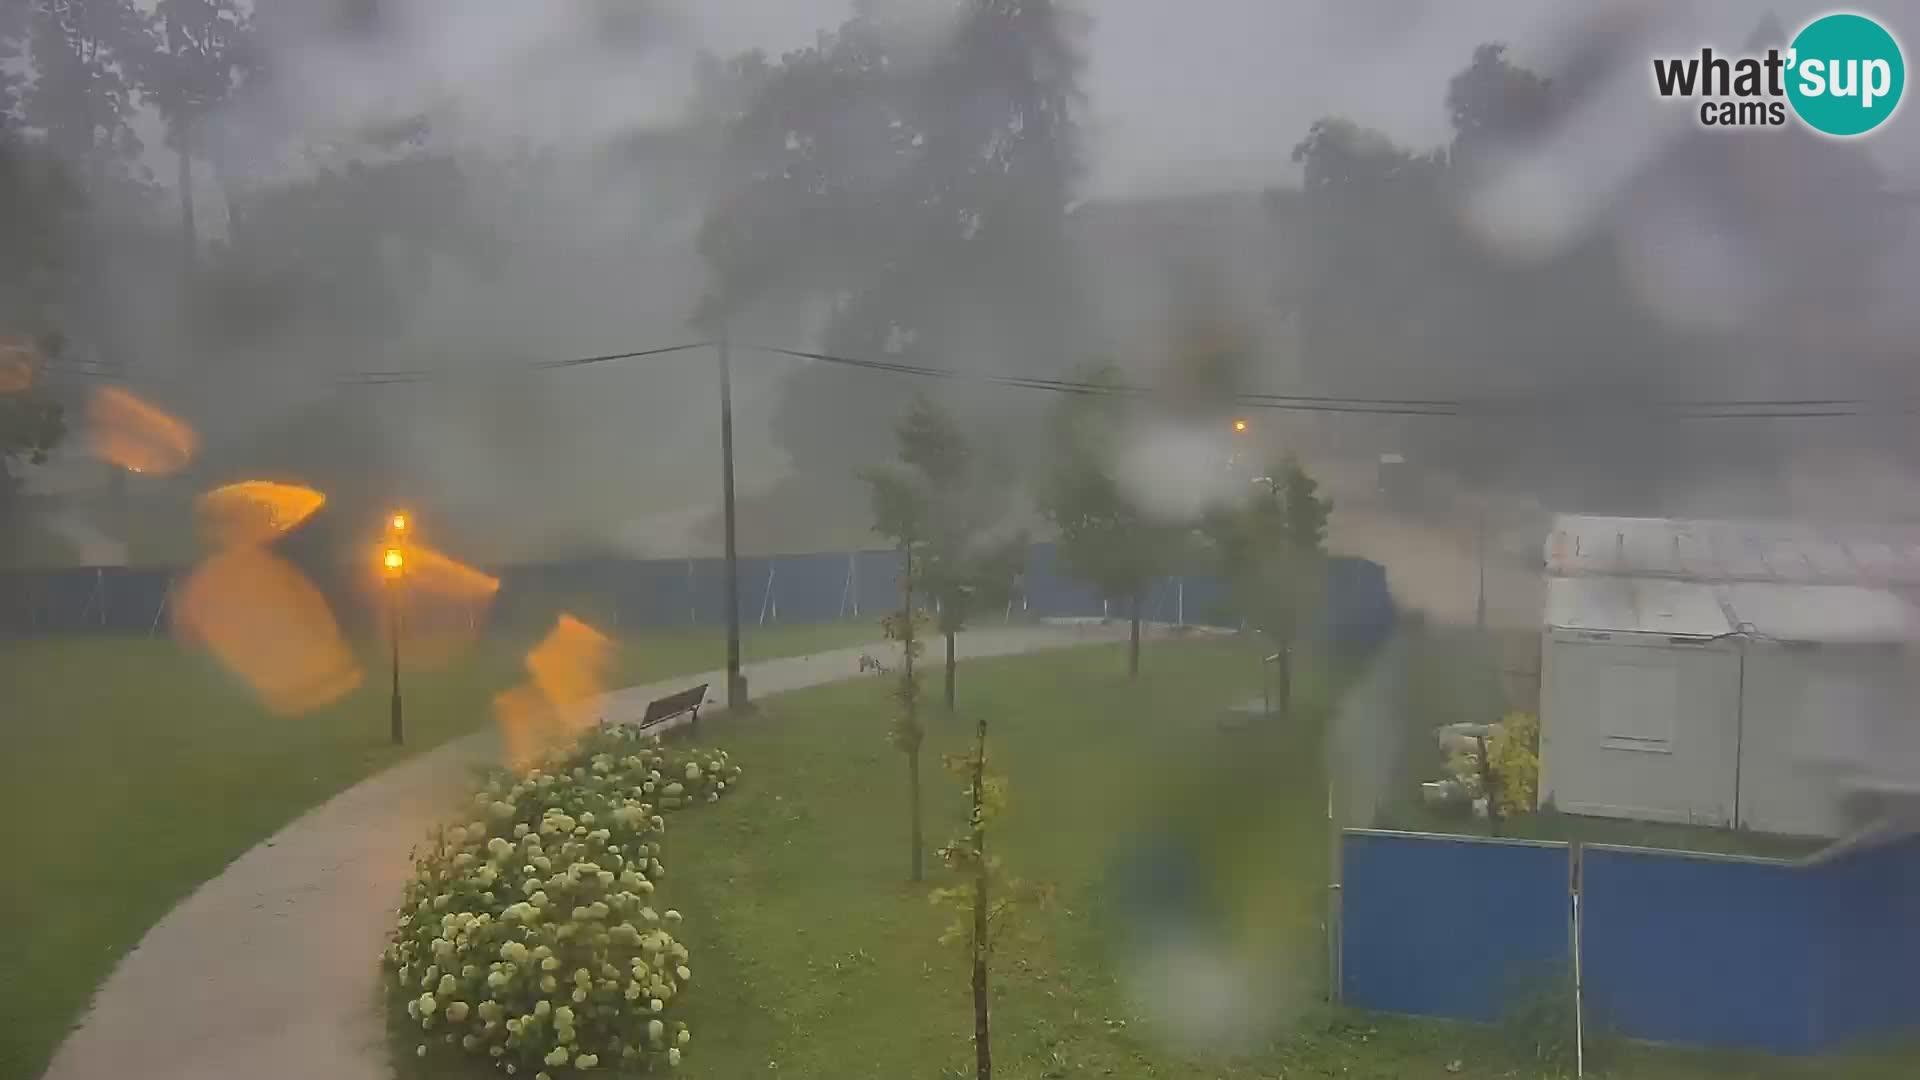 LIVEcam Perivoj Erdödy Castle Grounds webcam Jastrebarsko